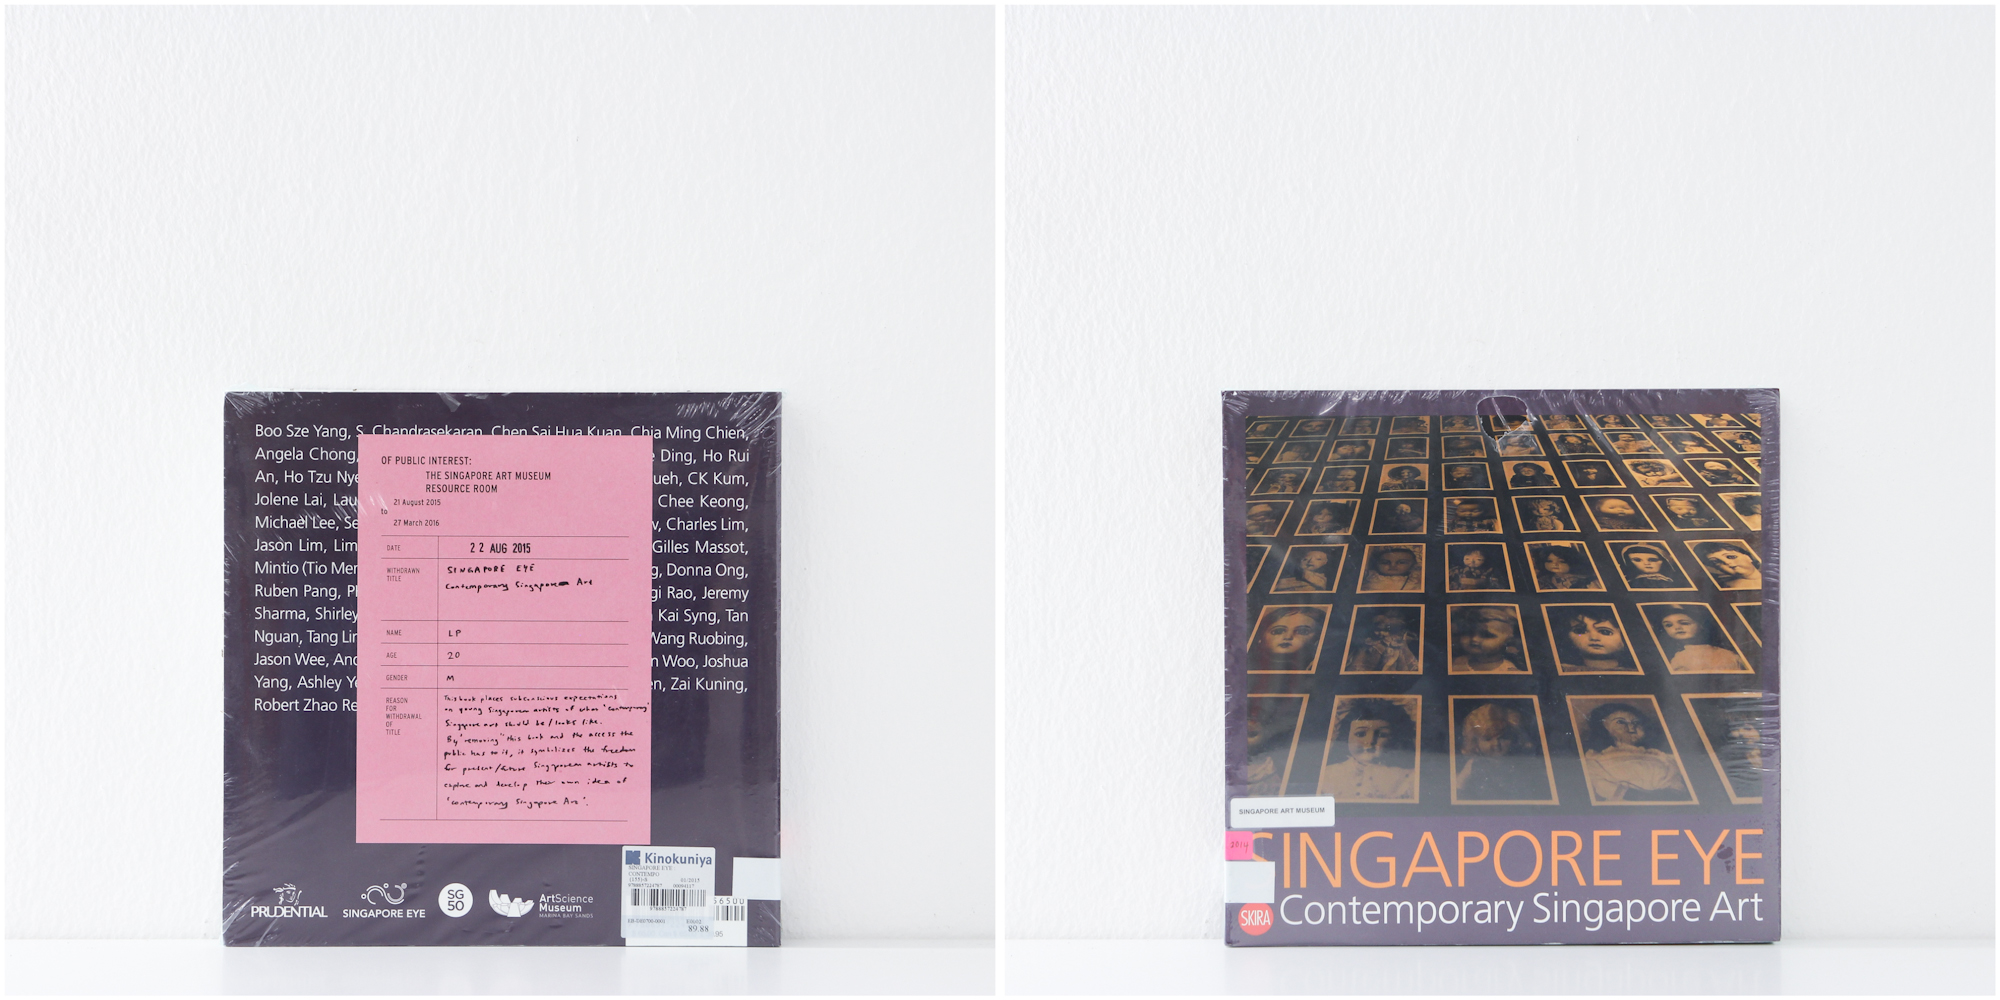 'Singapore Eye, Contemporary Singapore Art', 22/8/15, LP, 20, Male